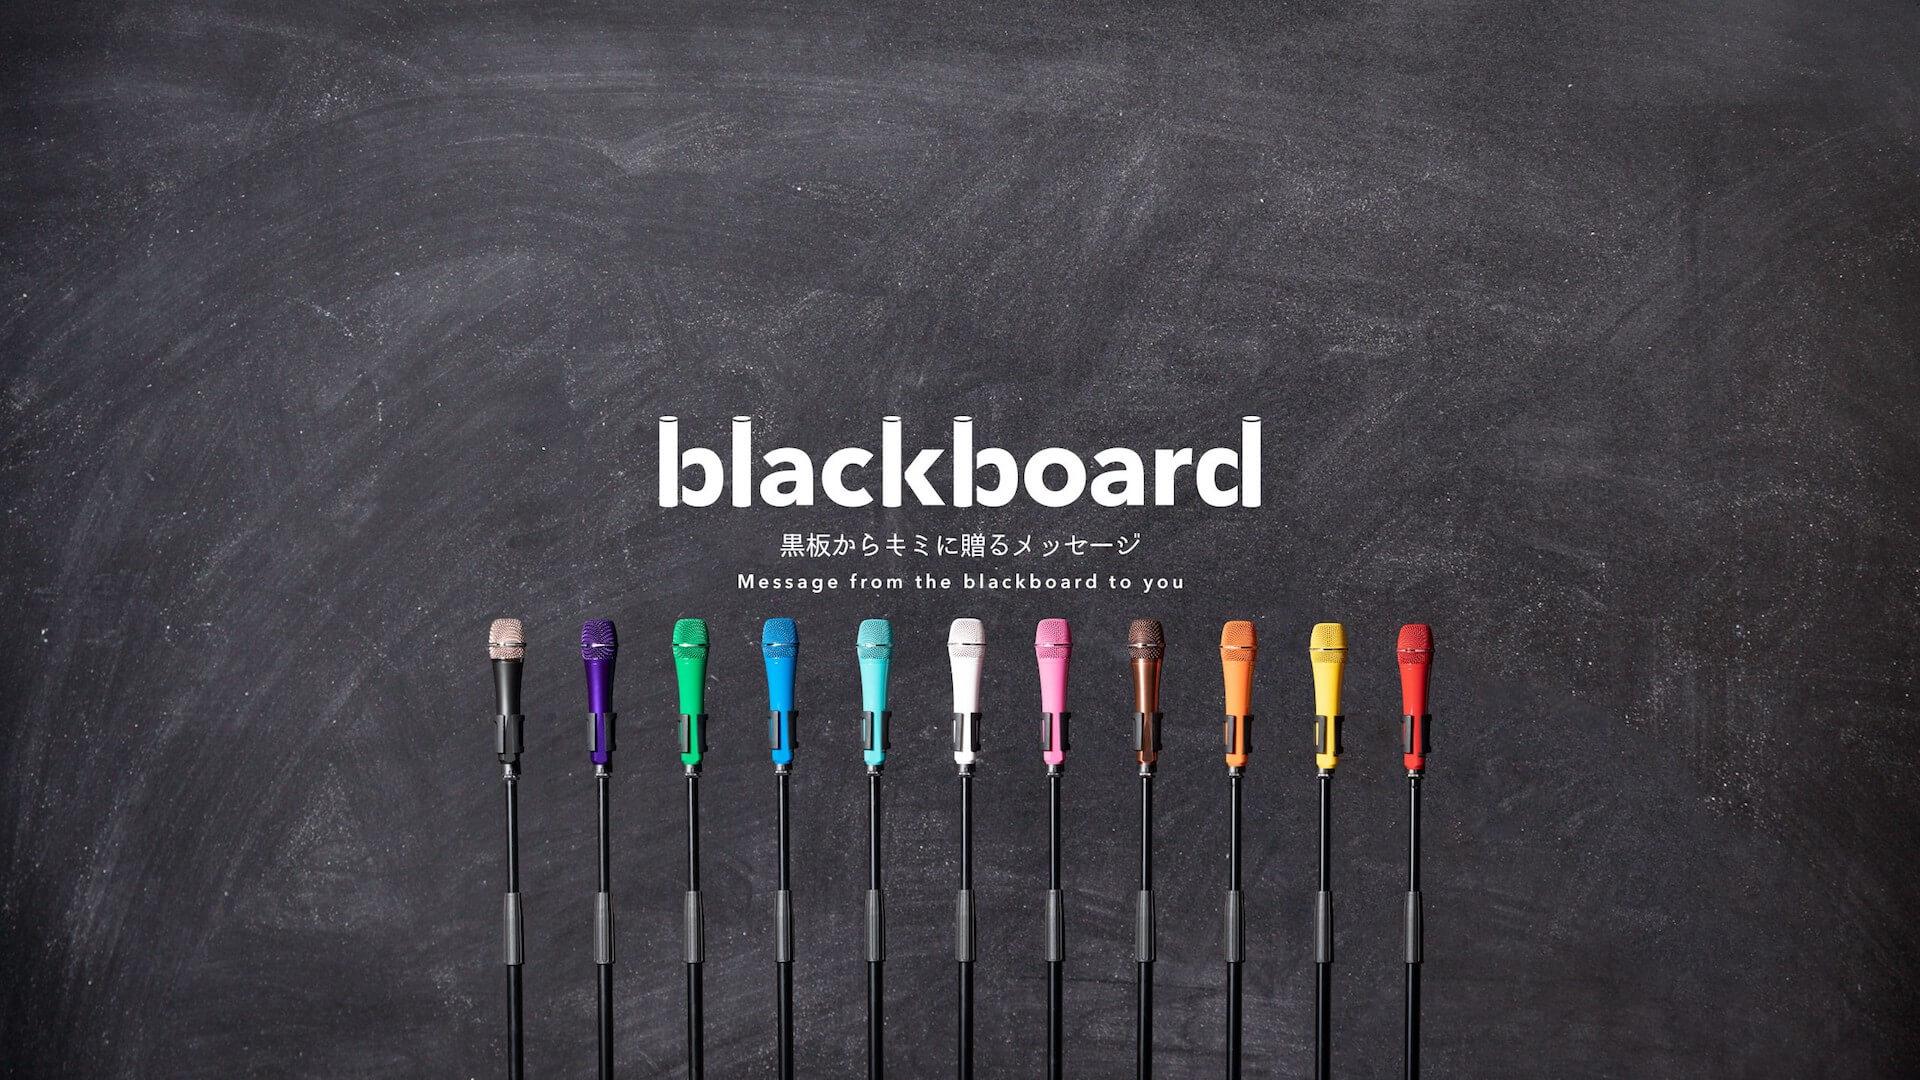 "chelmicoがYouTubeチャンネル「blackboard」で再び先生に!『maze』収録の楽曲""Terminal 着、即 Dance (blackboard version)""をライブ歌唱 music200930_chelmico_1"